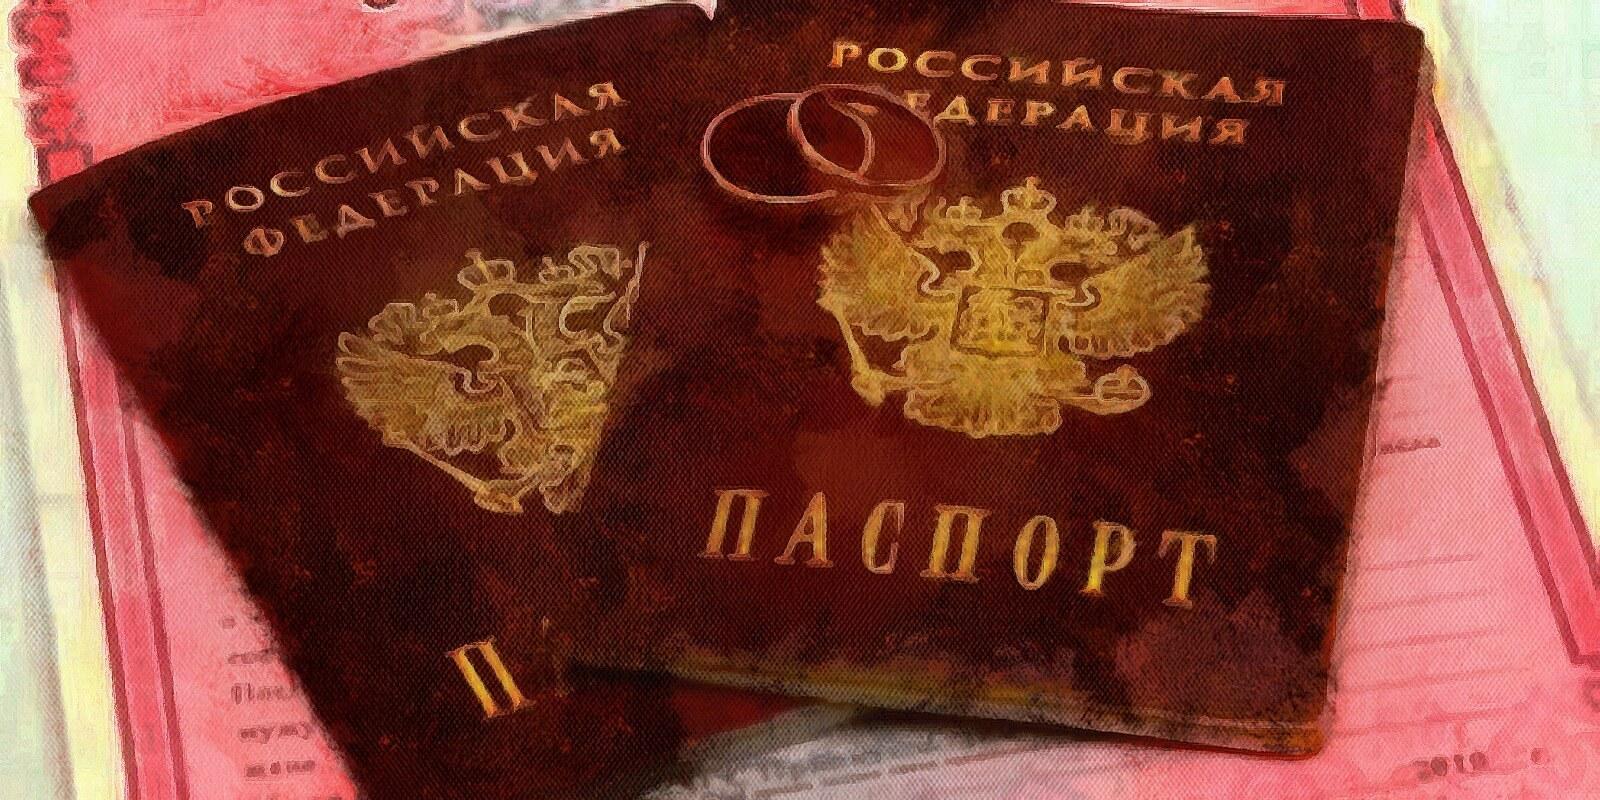 Как влияет на кредитную историю замена паспорта или смена фамилии?